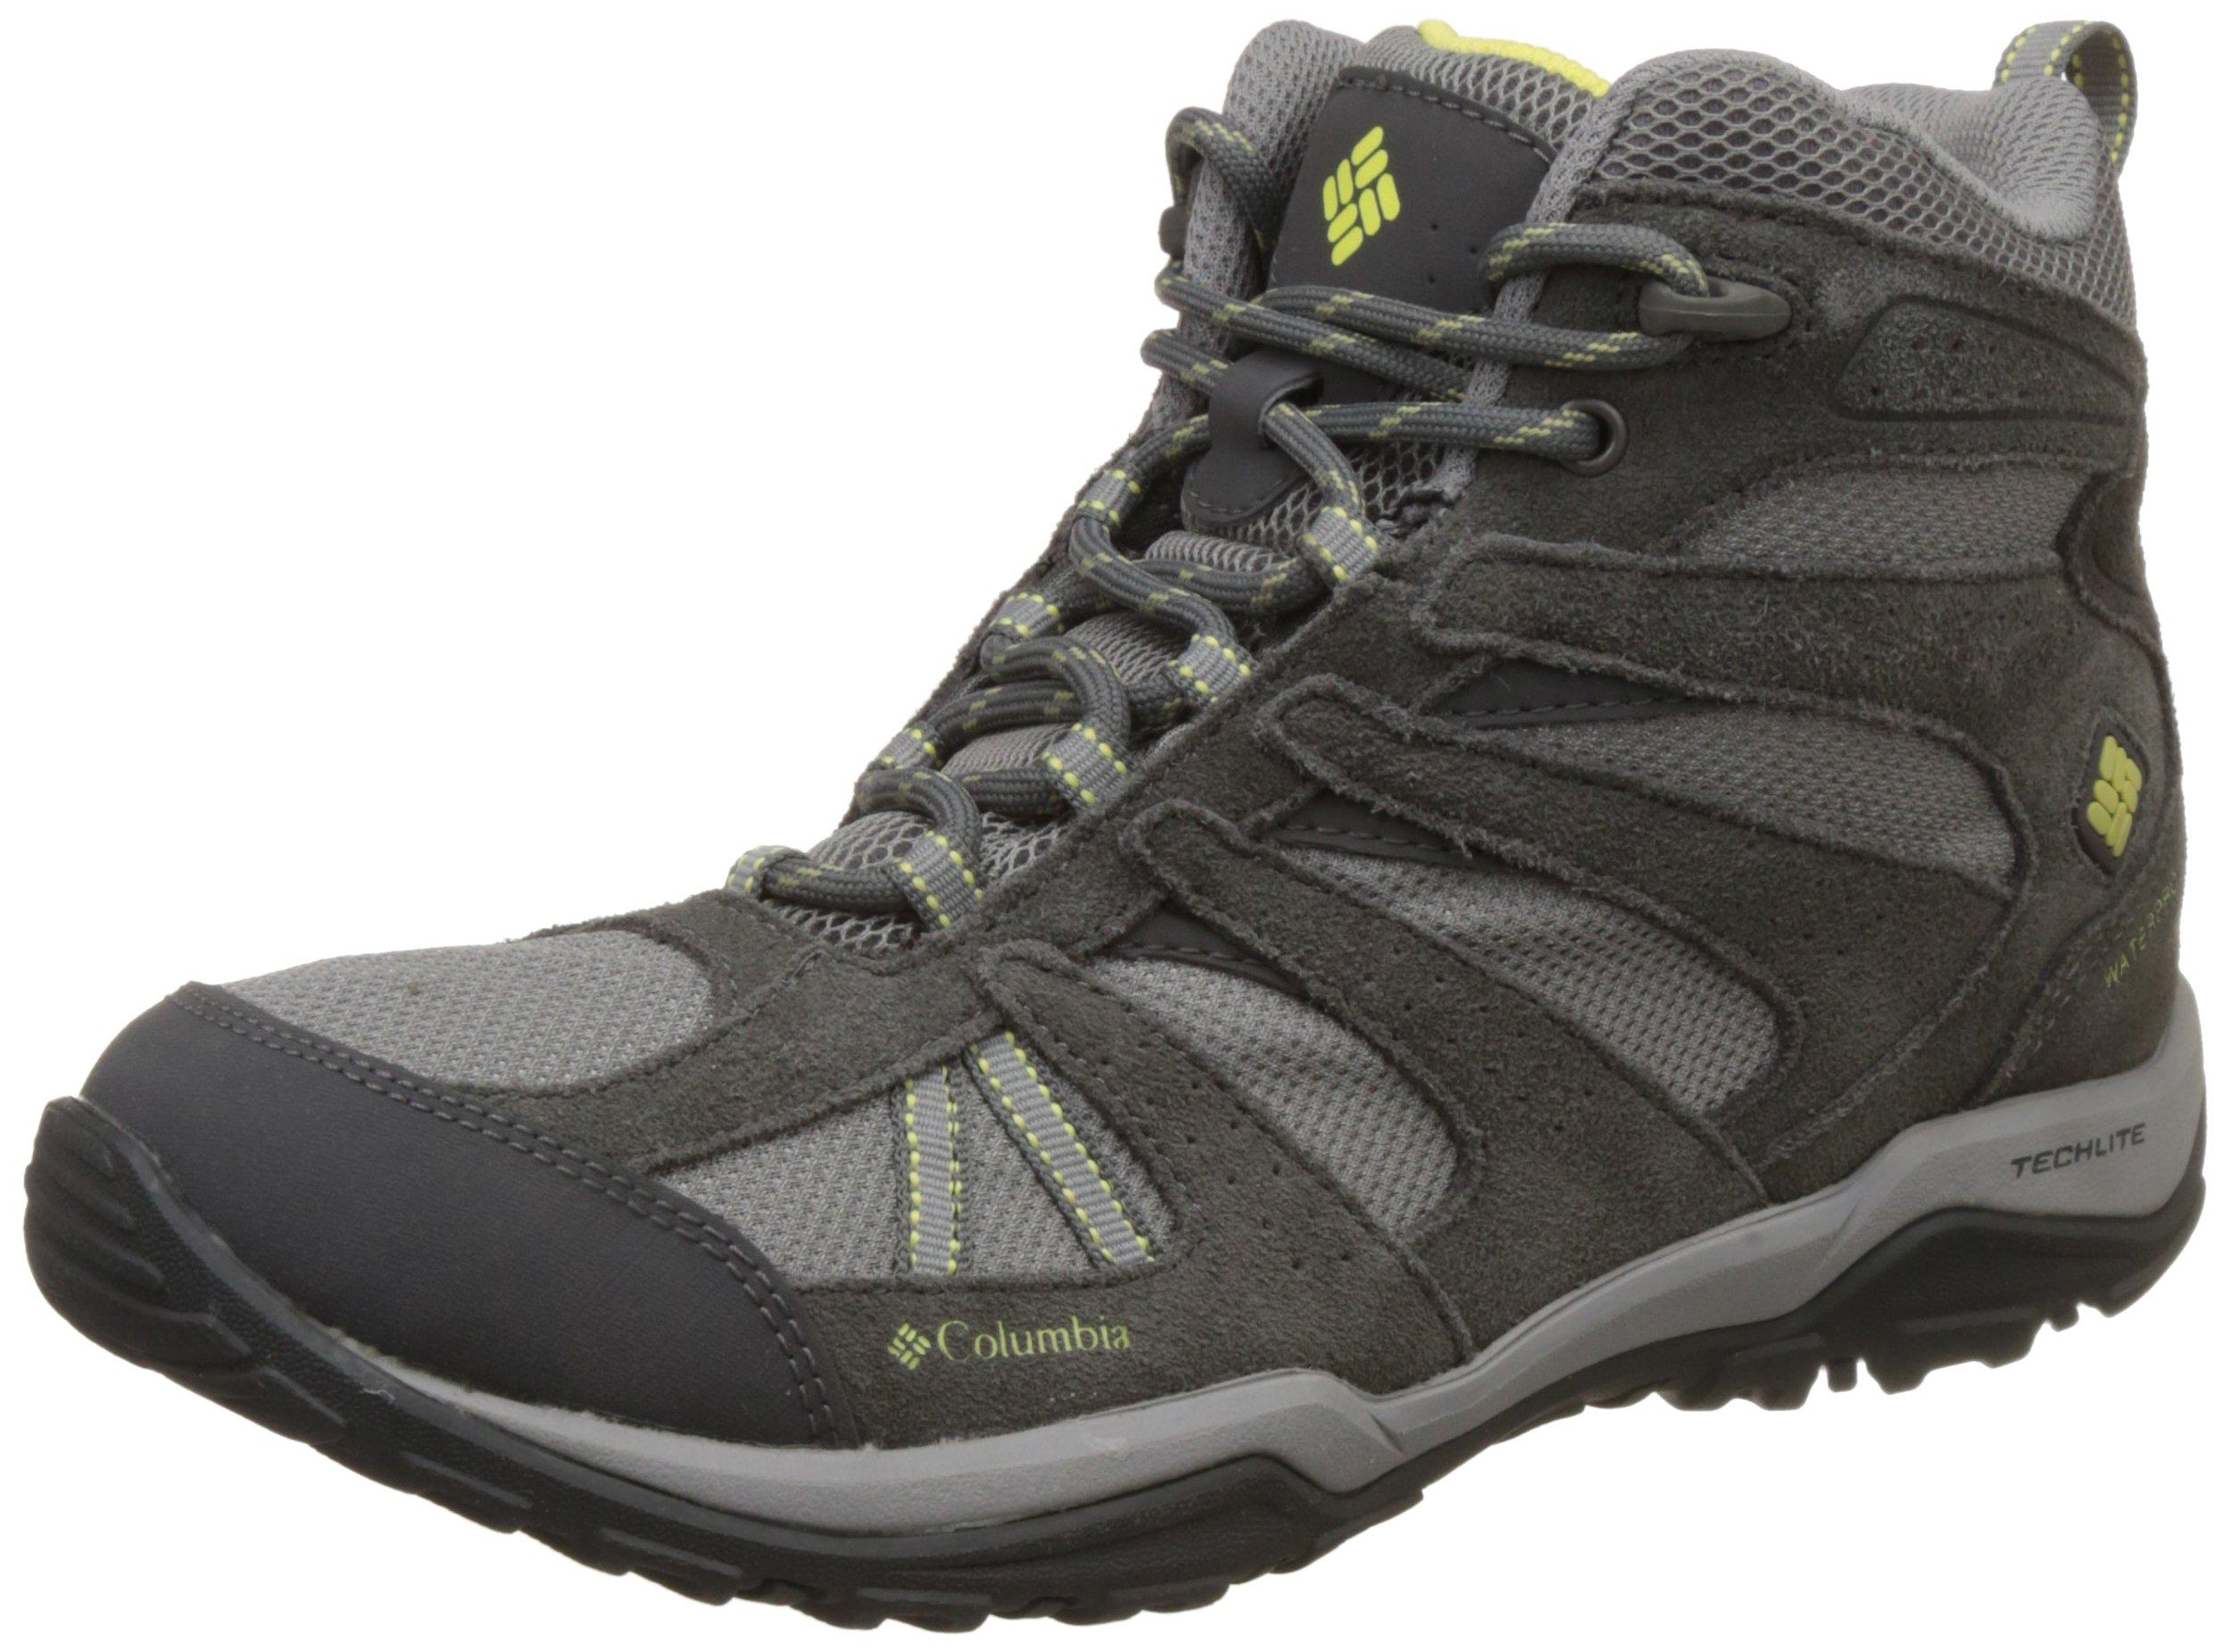 Columbia Women's Dakota Drifter Mid Waterproof Hiking Boot, Light Grey, Sunnyside, 9 B US